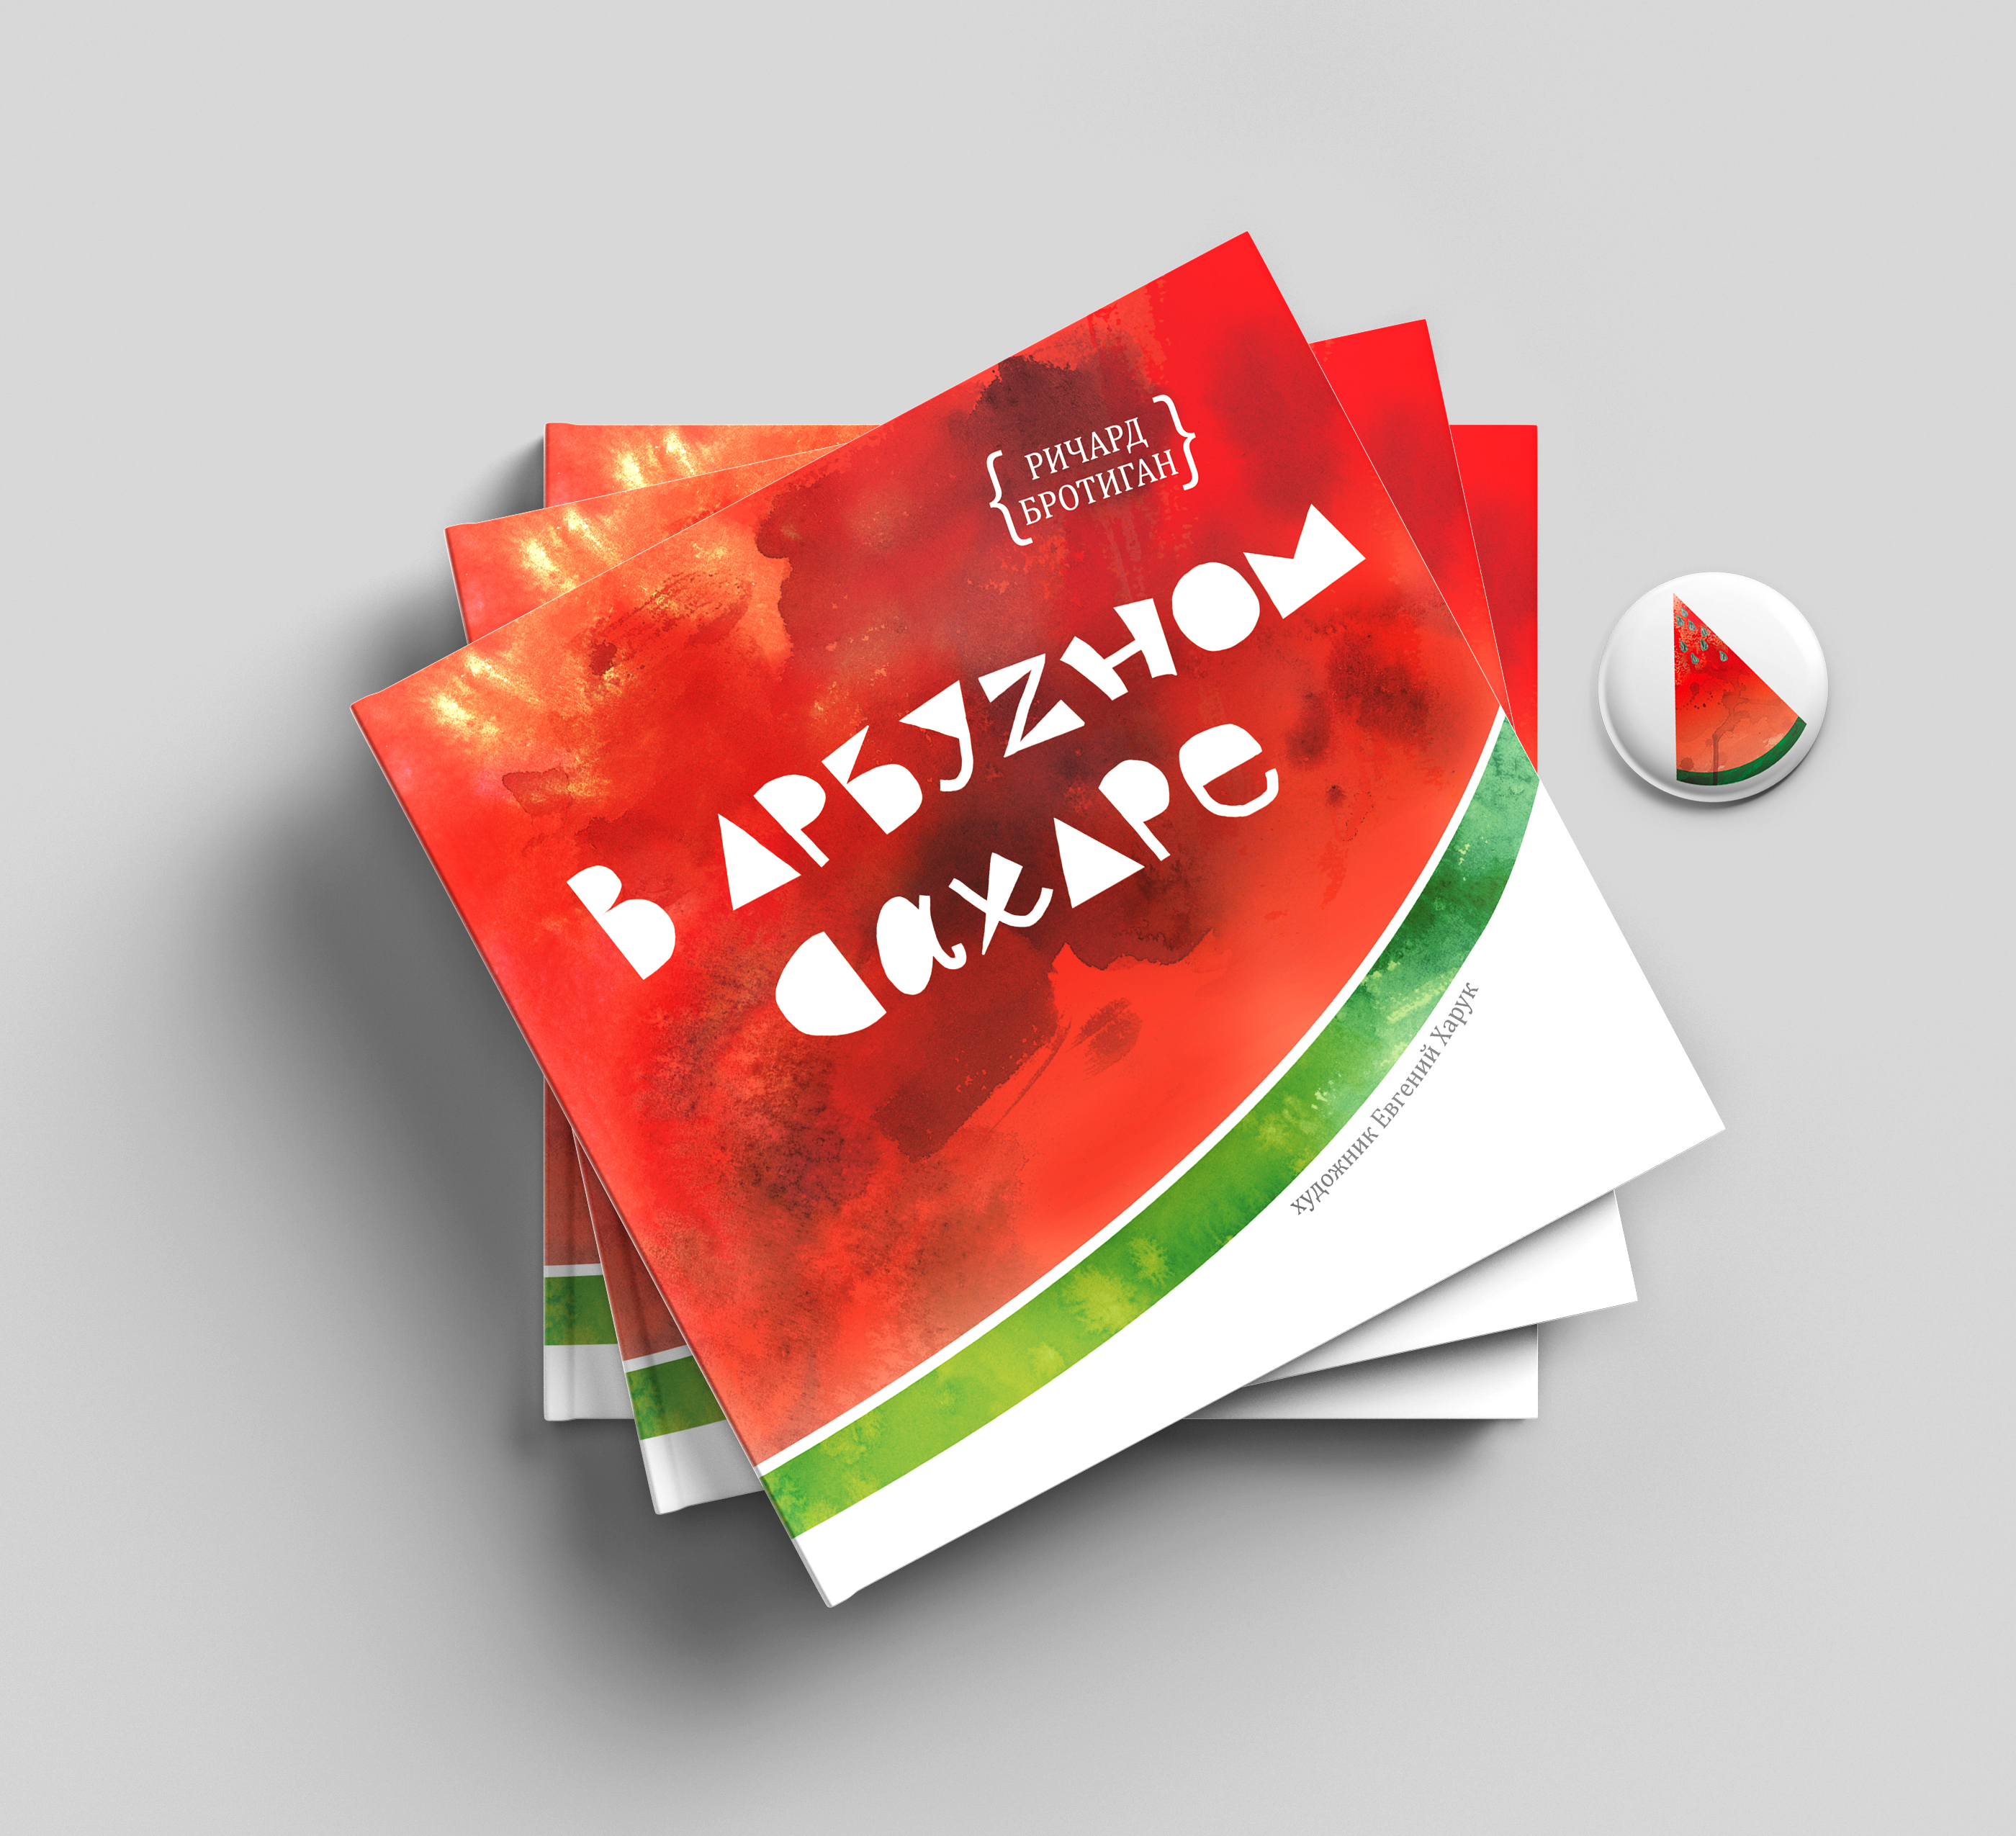 In Watermelon Sugar illustrations and book design